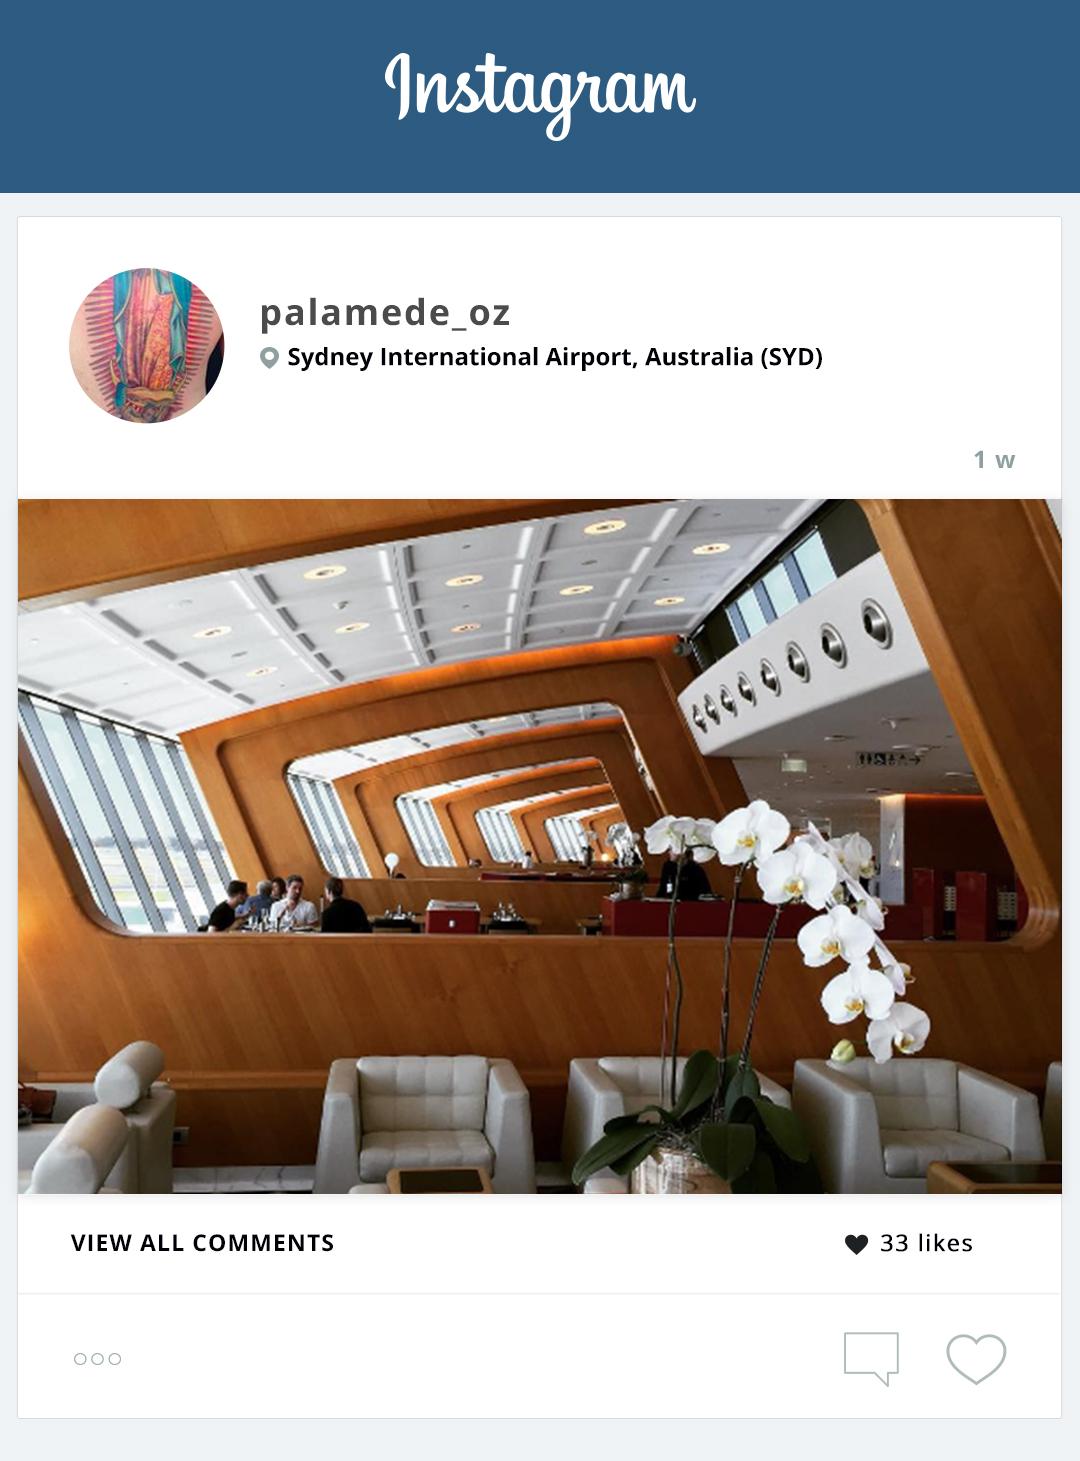 palamede_oz